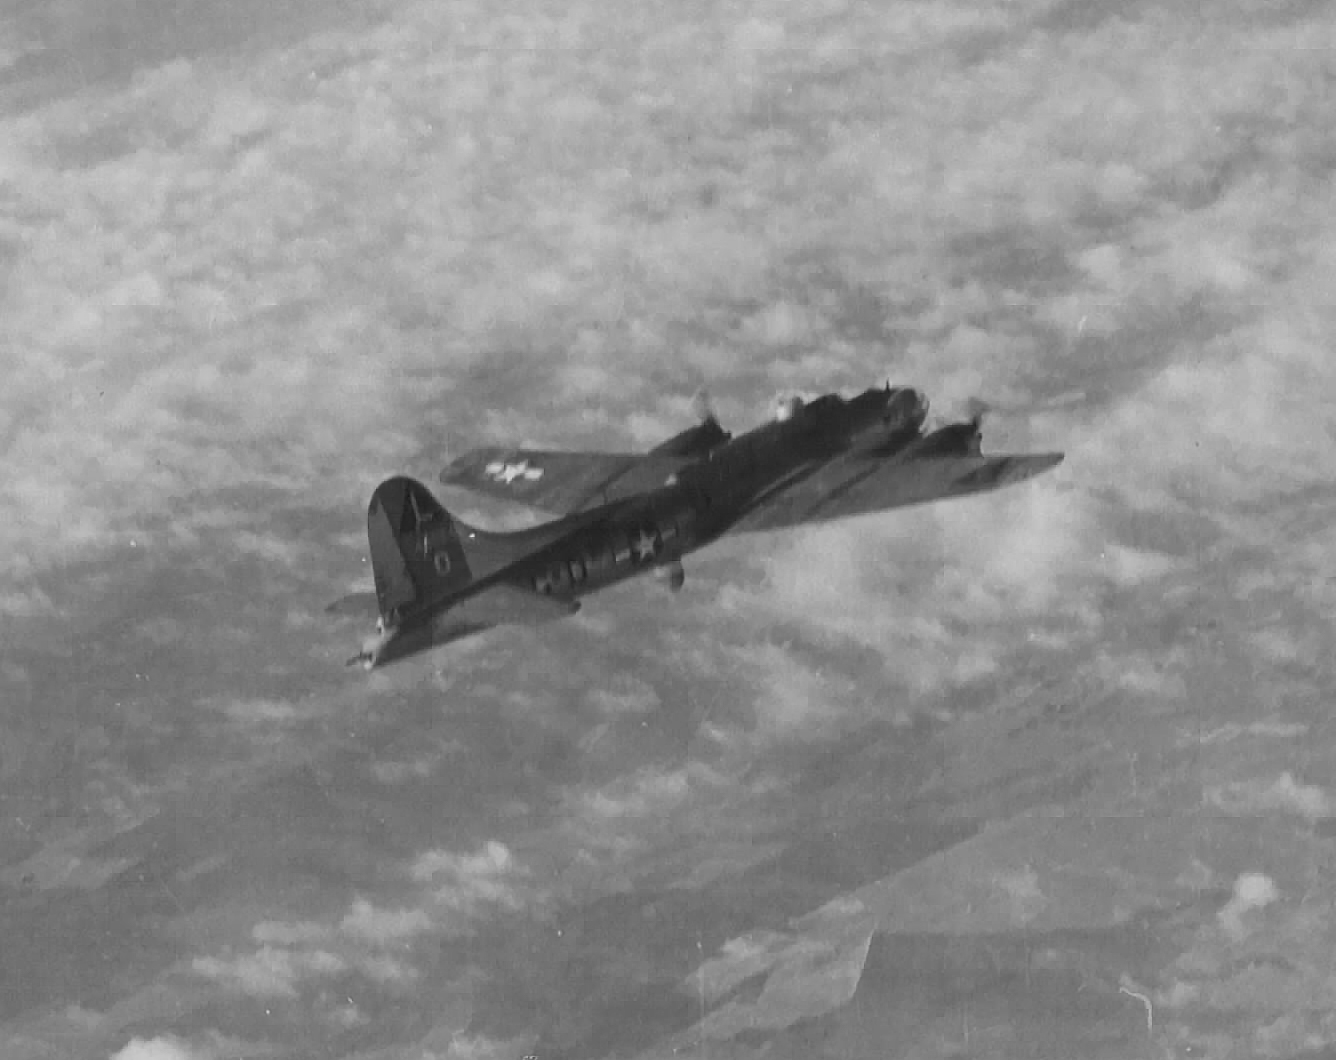 B-17 #44-8024